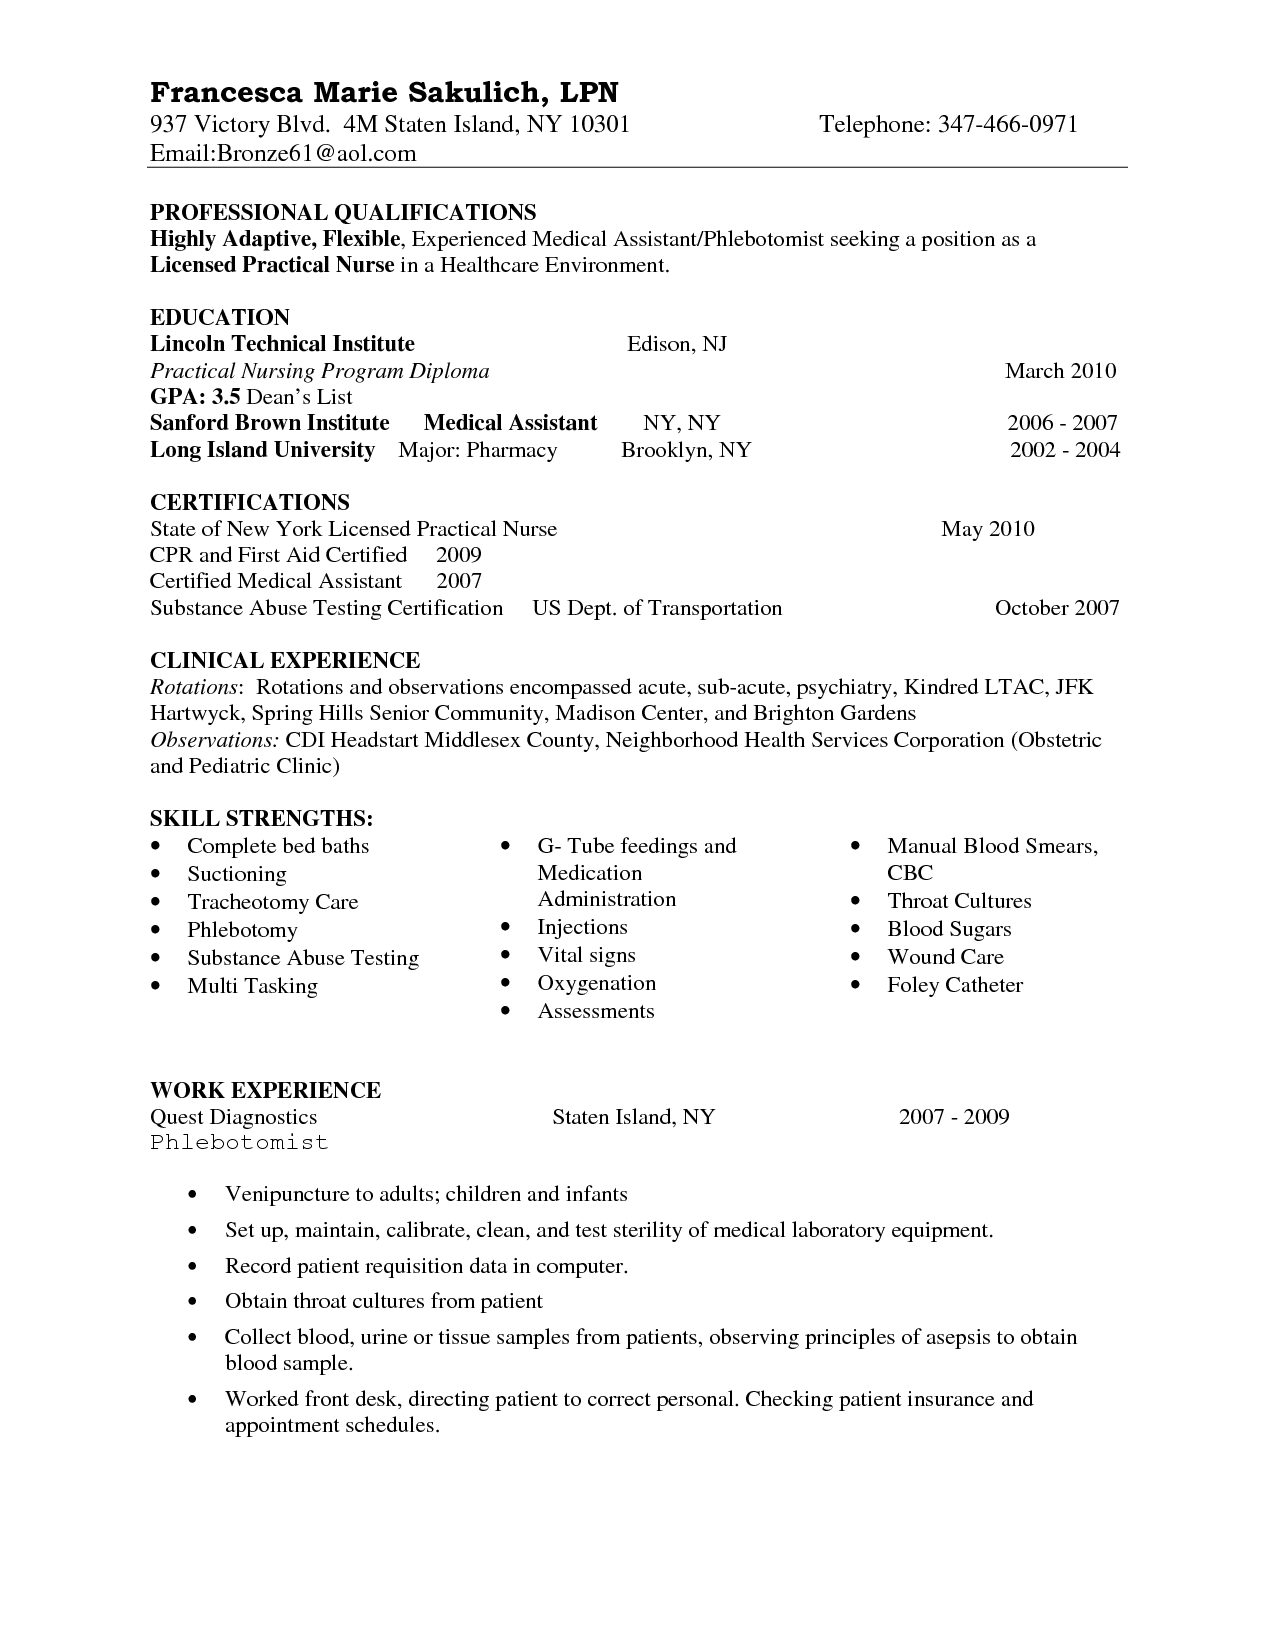 sample resume lpn no experience